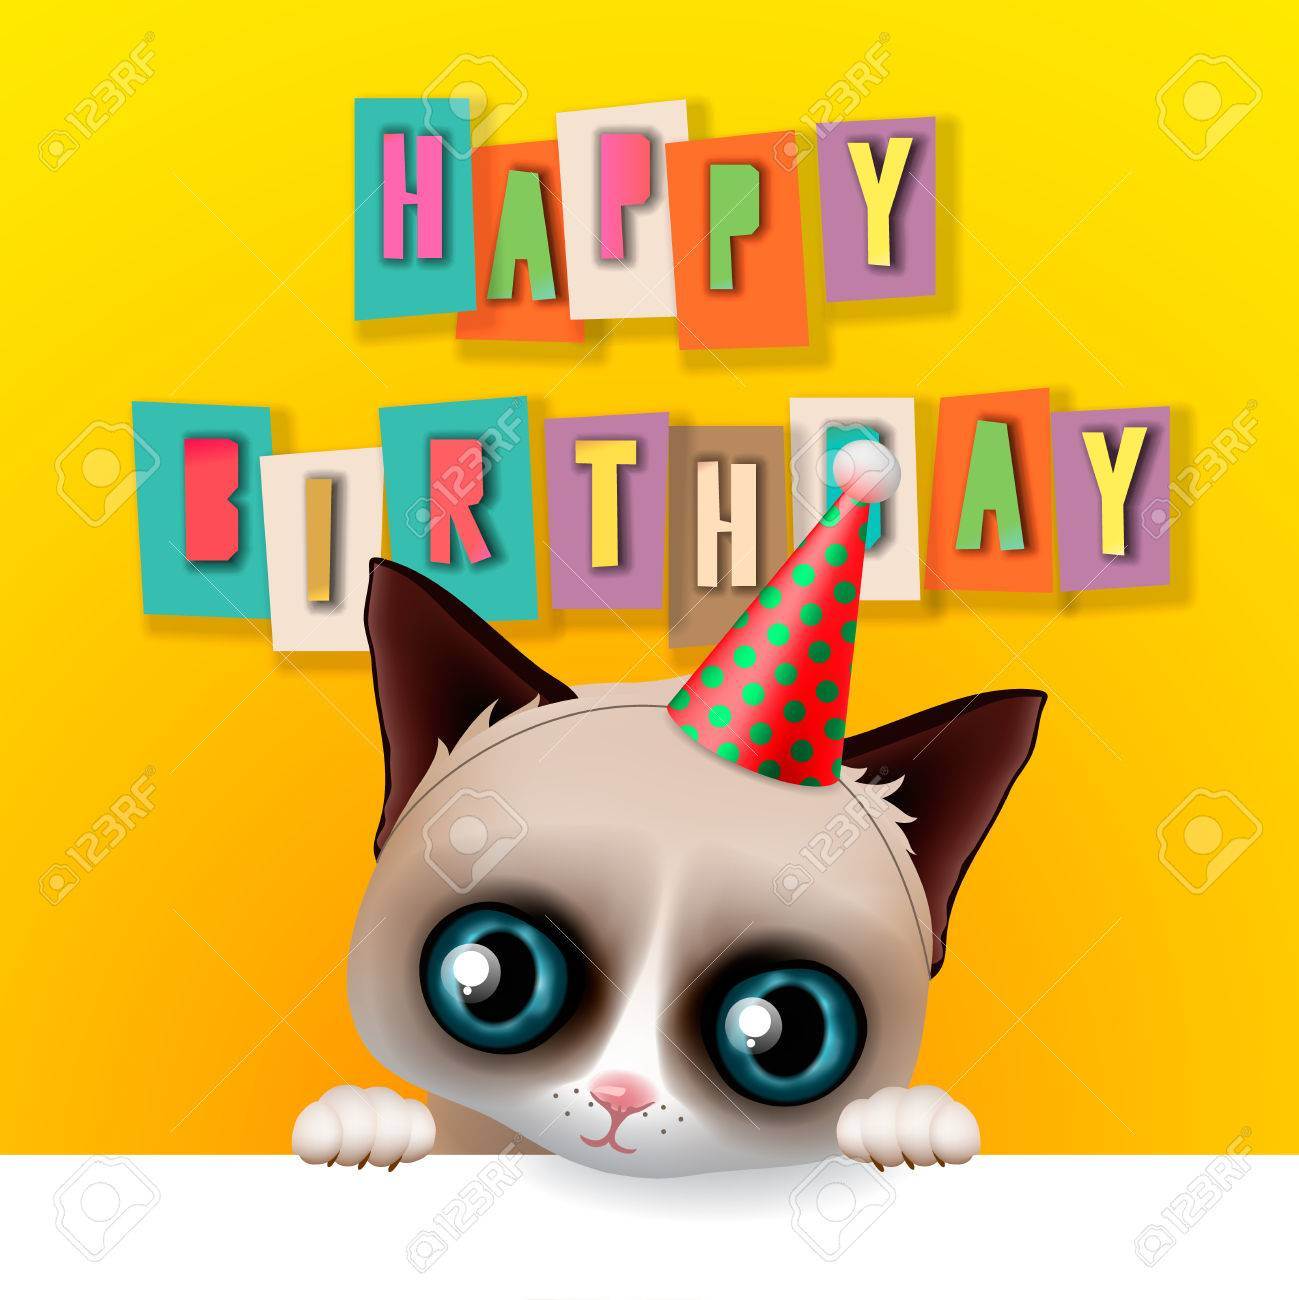 Cute happy birthday card with fun grumpy cat hipster design cute happy birthday card with fun grumpy cat hipster design vector illustration stock bookmarktalkfo Choice Image